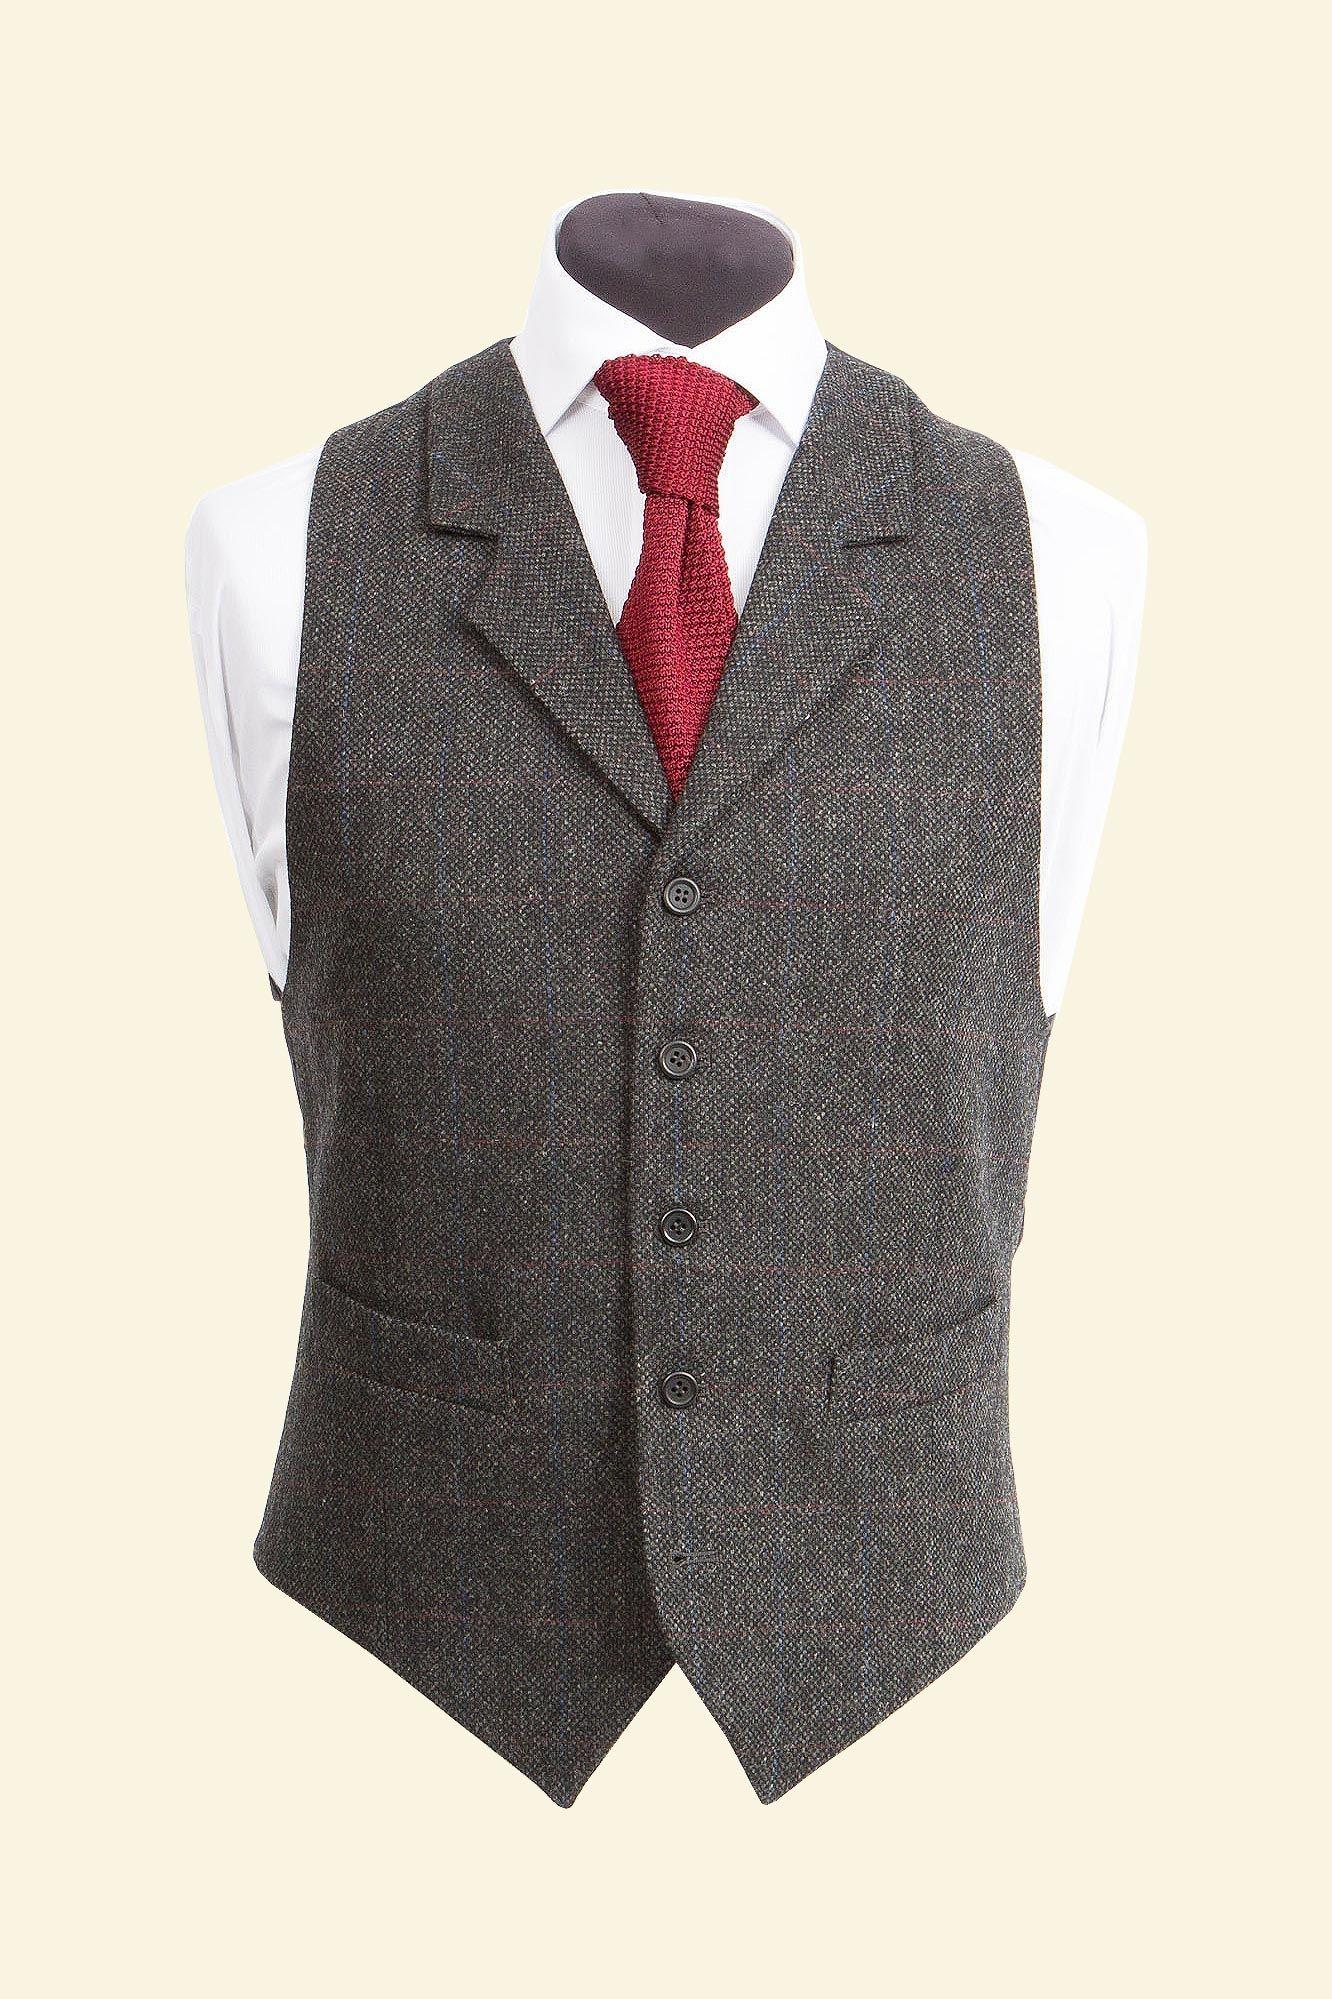 Charcoal Lambswool Red Windowpane Tweed Edward Waistcoat - Tweed Suit Waistcoats - Clothing - Men Walker Slater Tweed Specialists